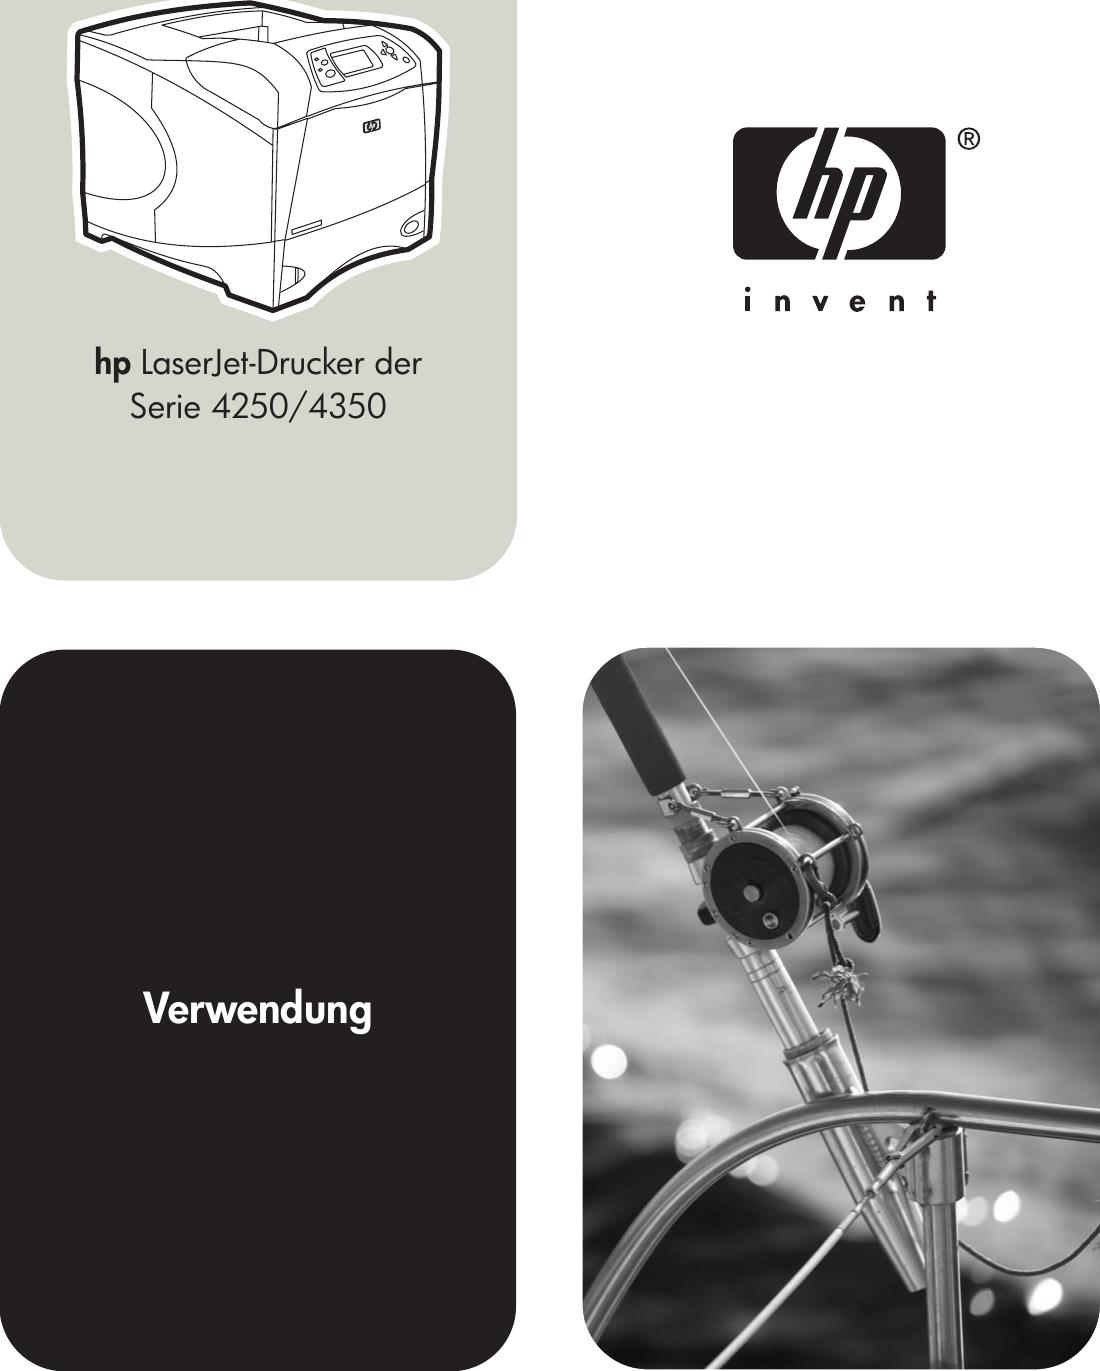 HP LaserJet 4250/4350 Series Printer User Guide DEWW Laser Jet C00218685